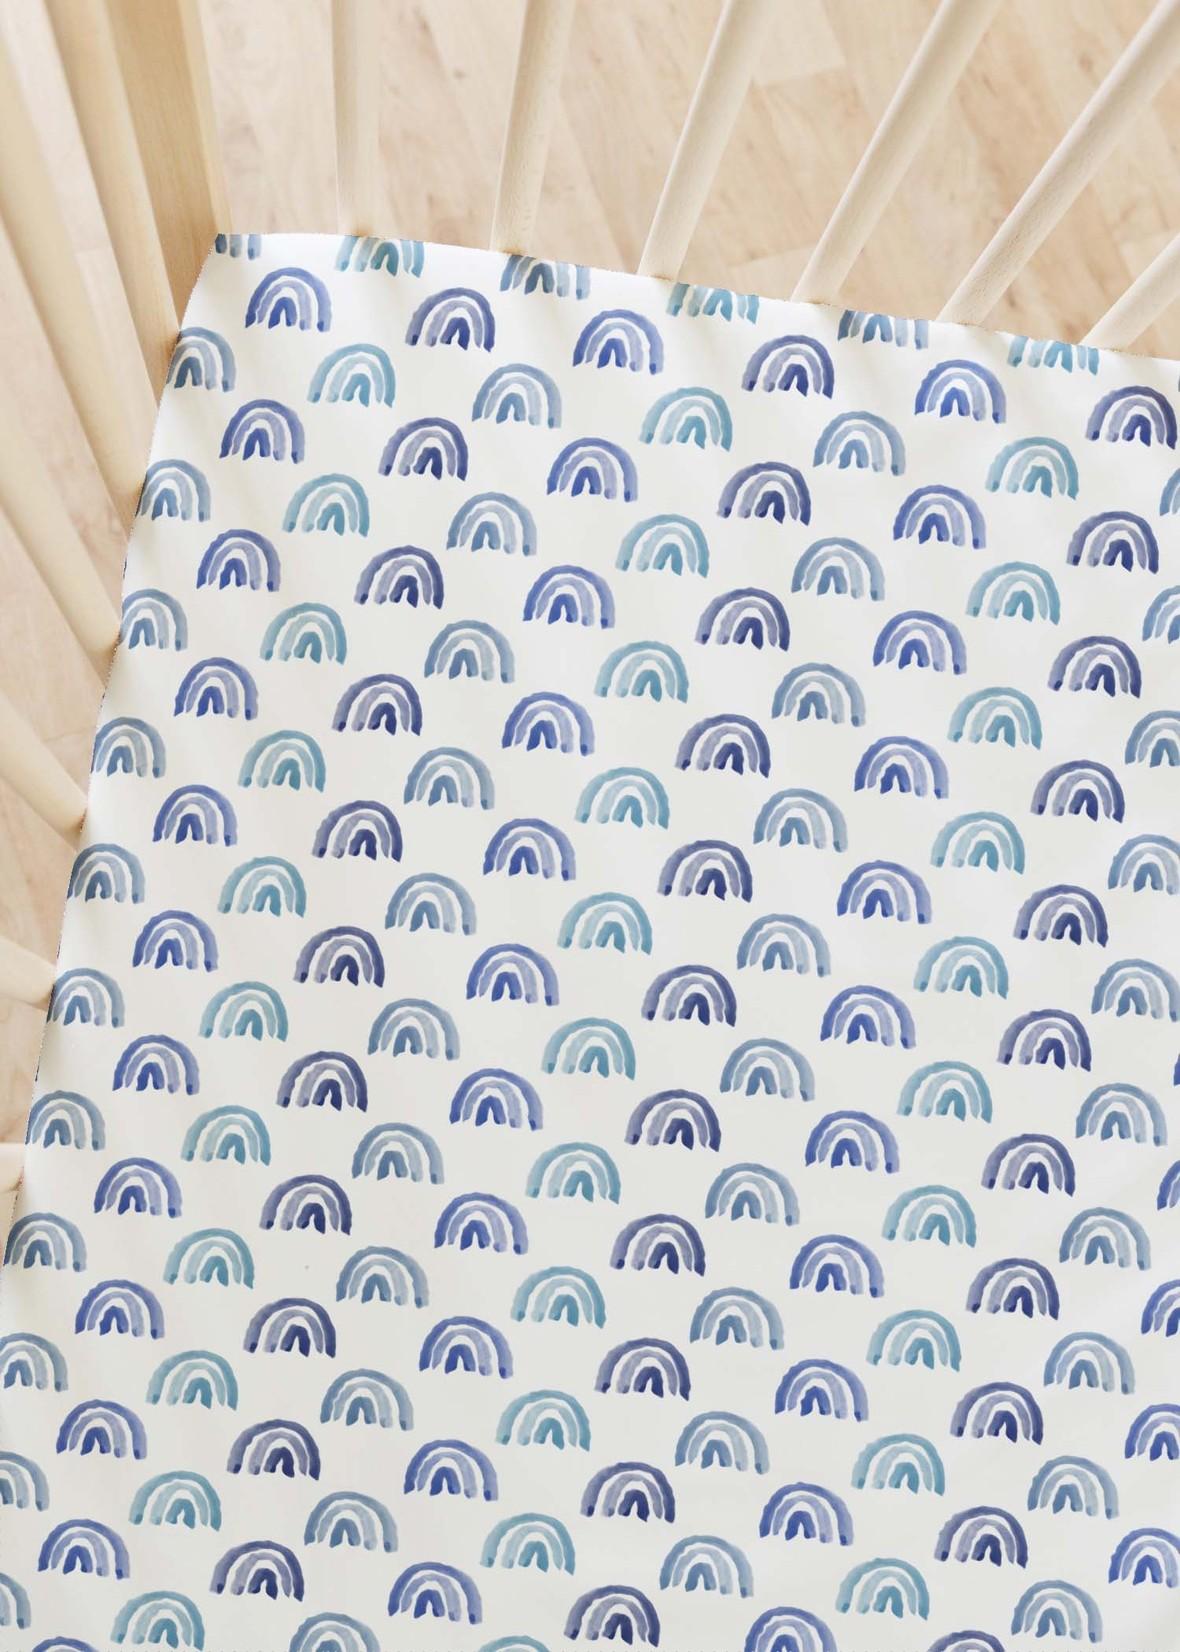 Crib Sheets Rainbow Row in Blue Sky